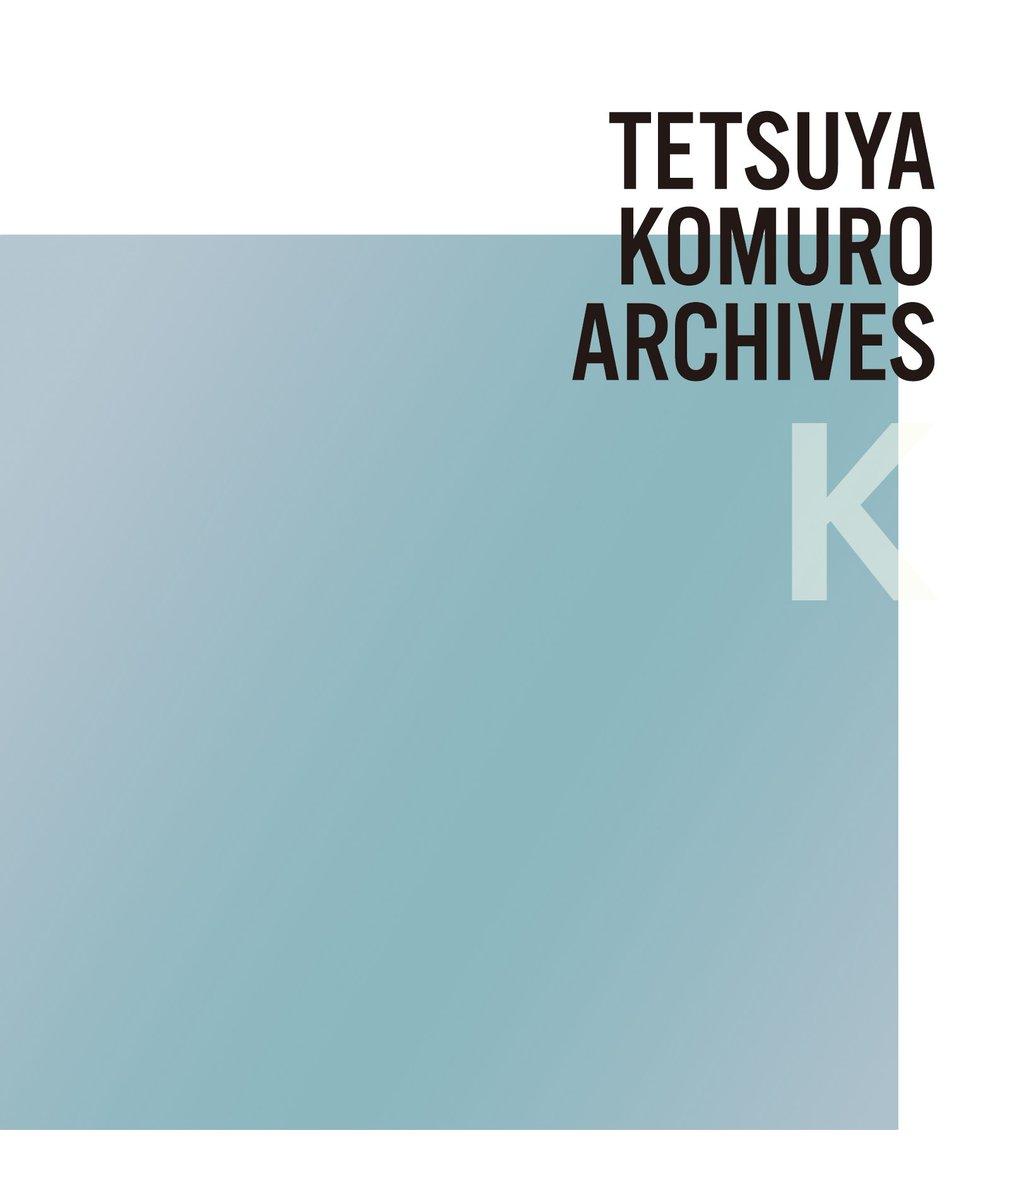 TETSUYA KOMURO ARCHIVES Kに関する画像8